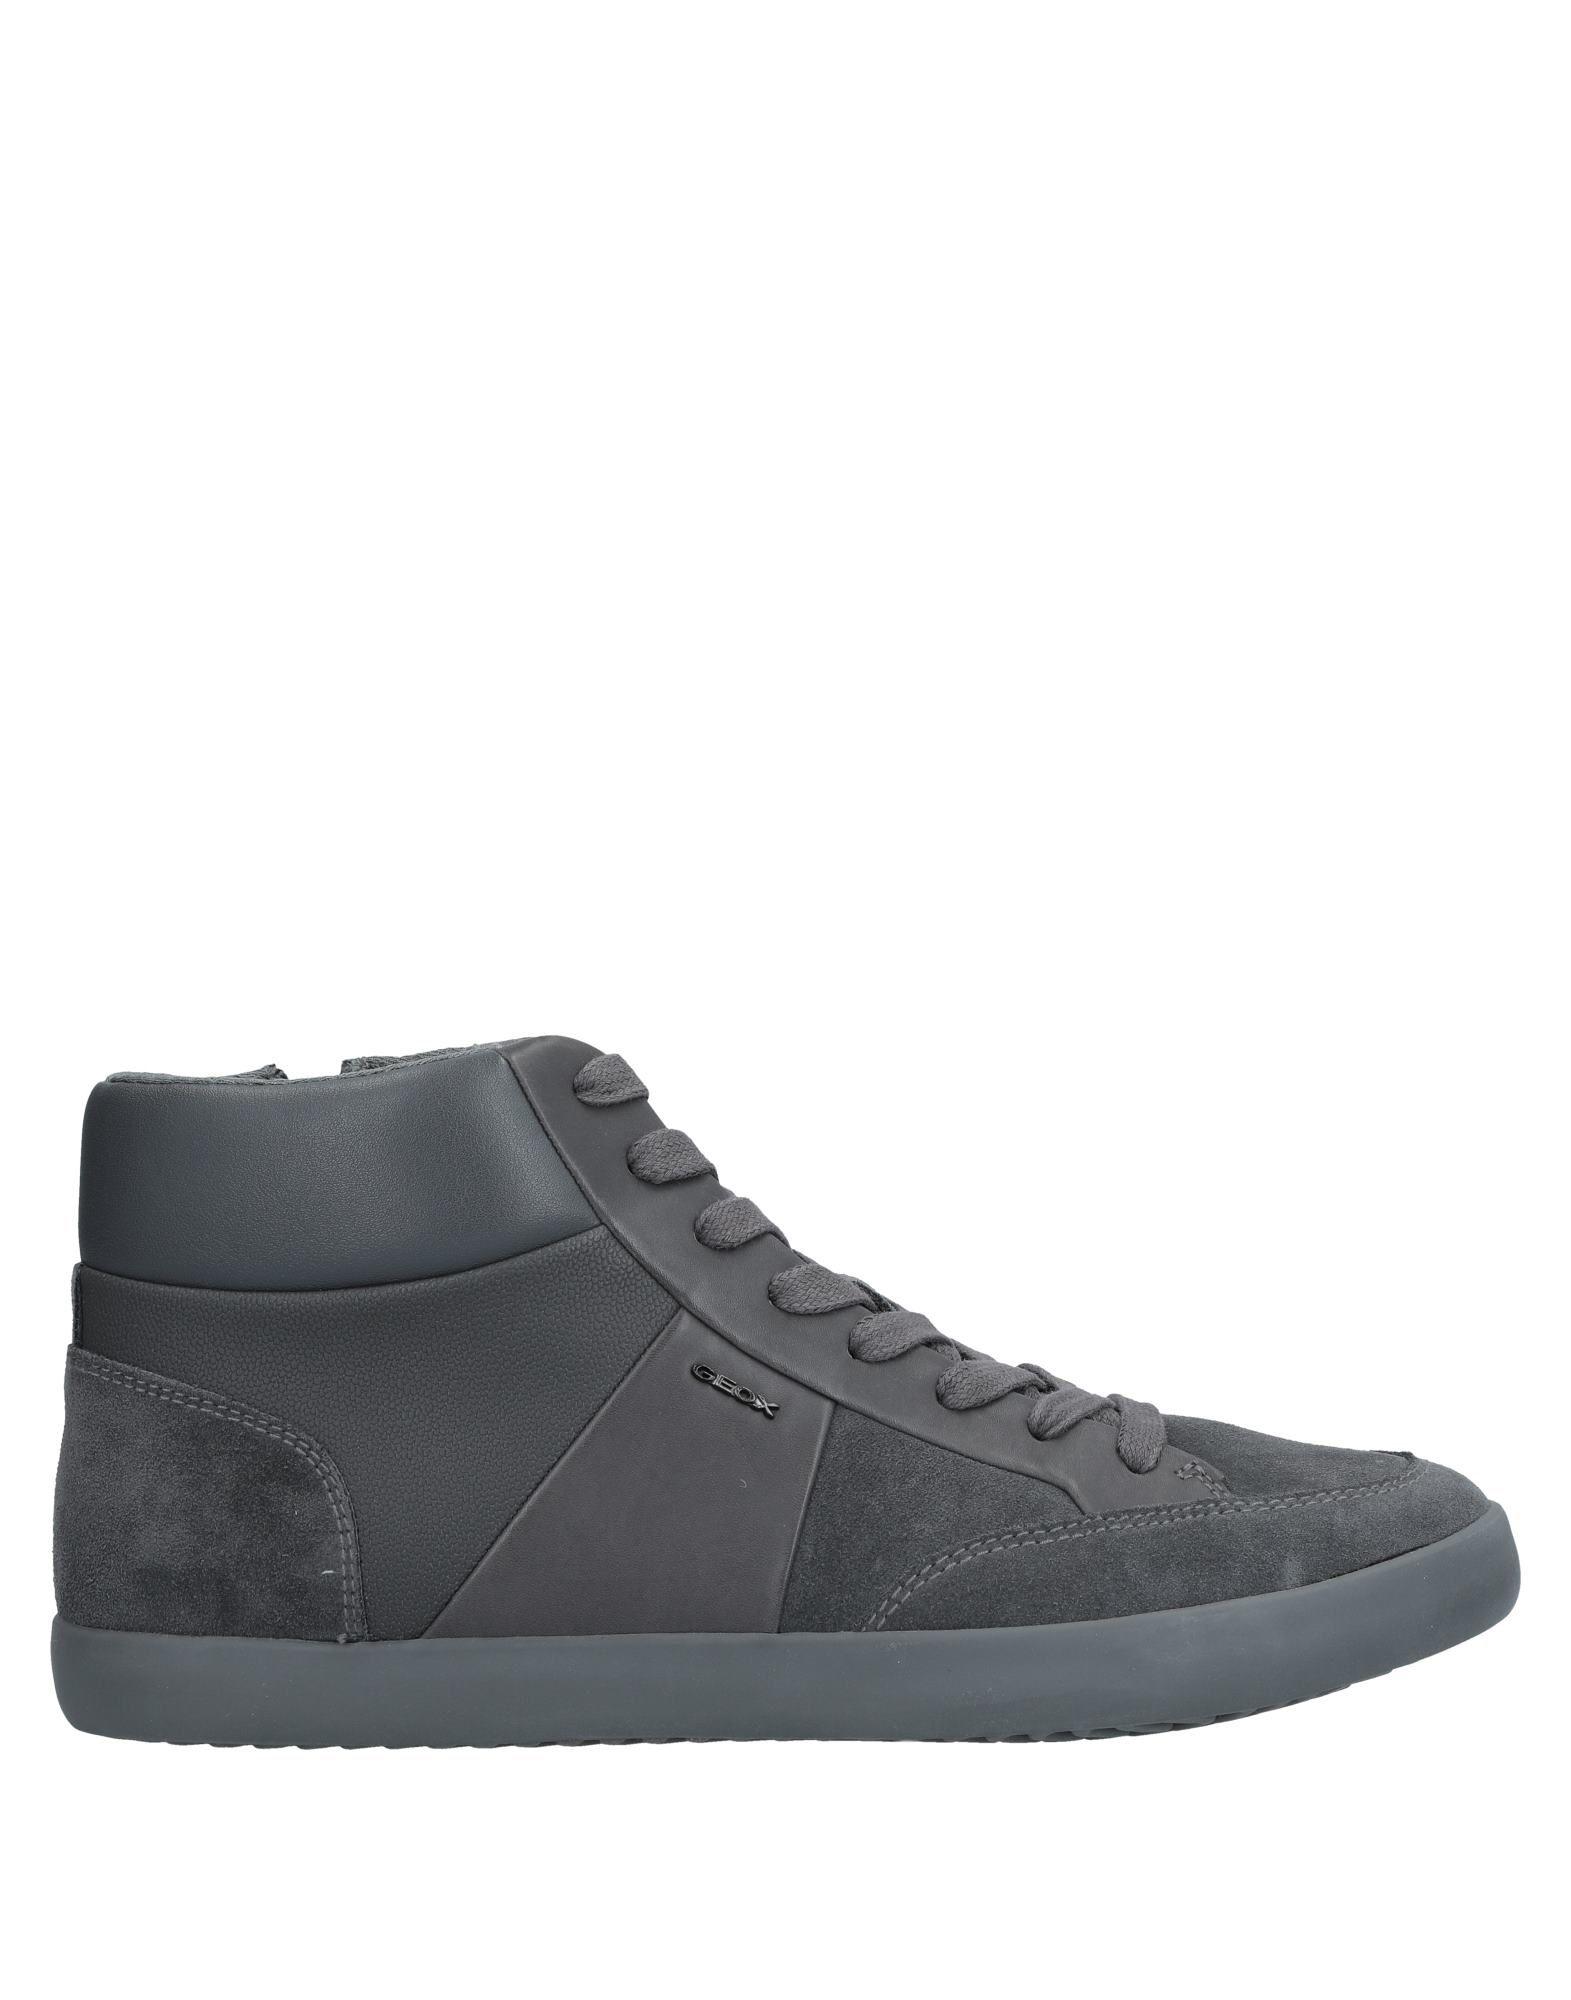 Sneakers Geox Homme - Sneakers Geox  Plomb Remise de marque